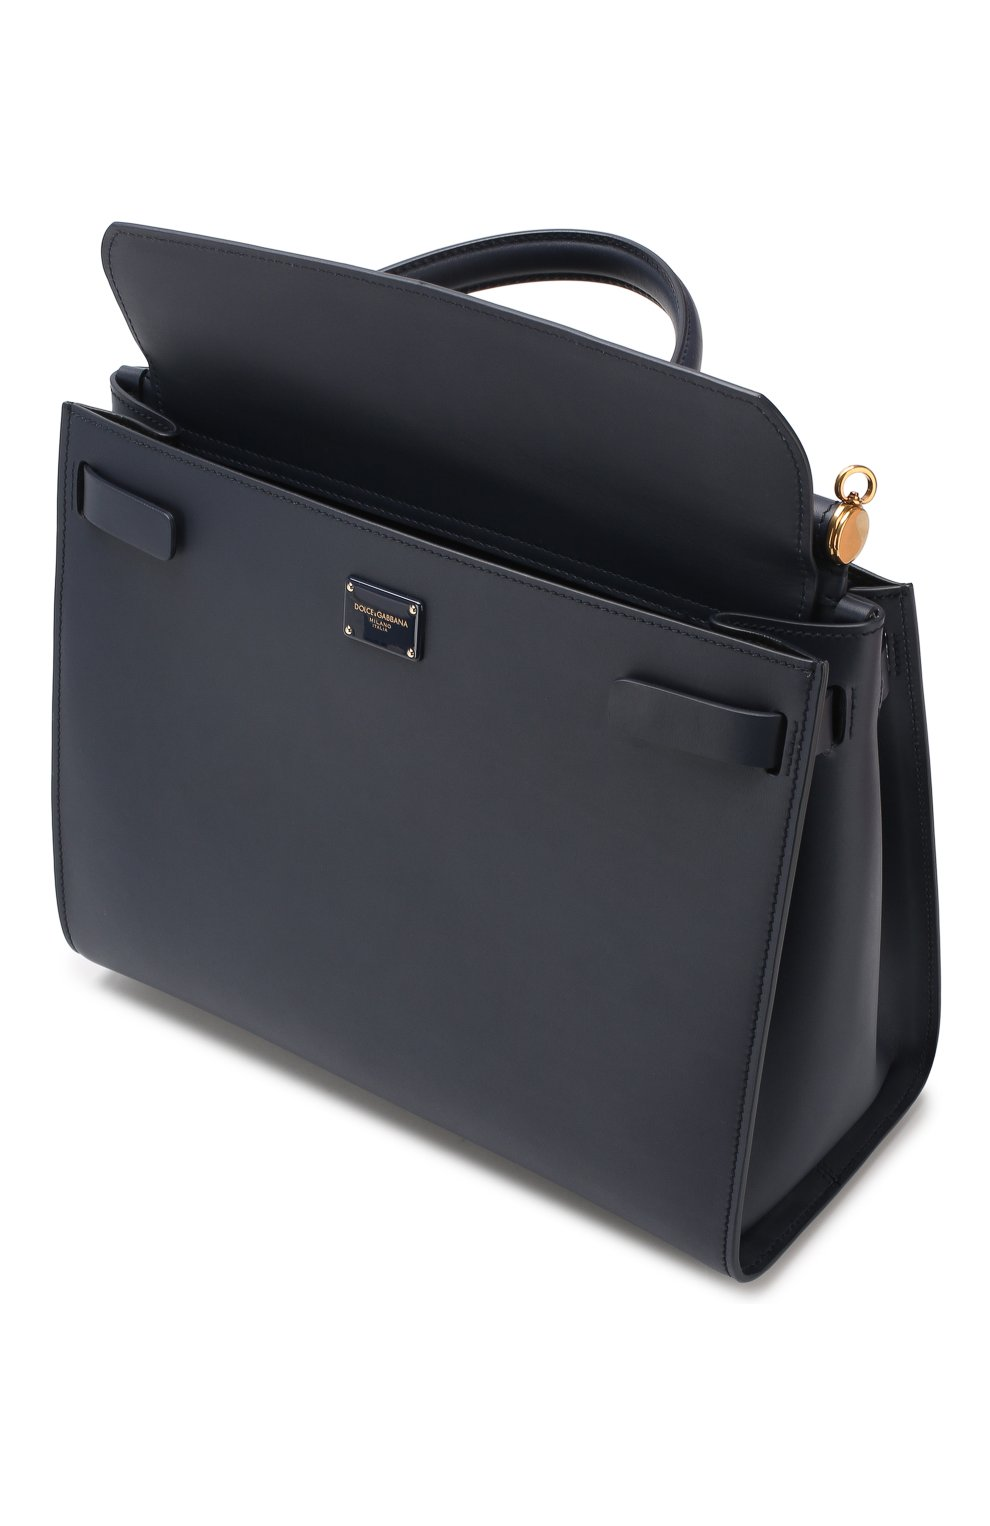 7f4ec153d46b Сумки Dolce & Gabbana по цене от 19 700 руб. купить в интернет-магазине ЦУМ